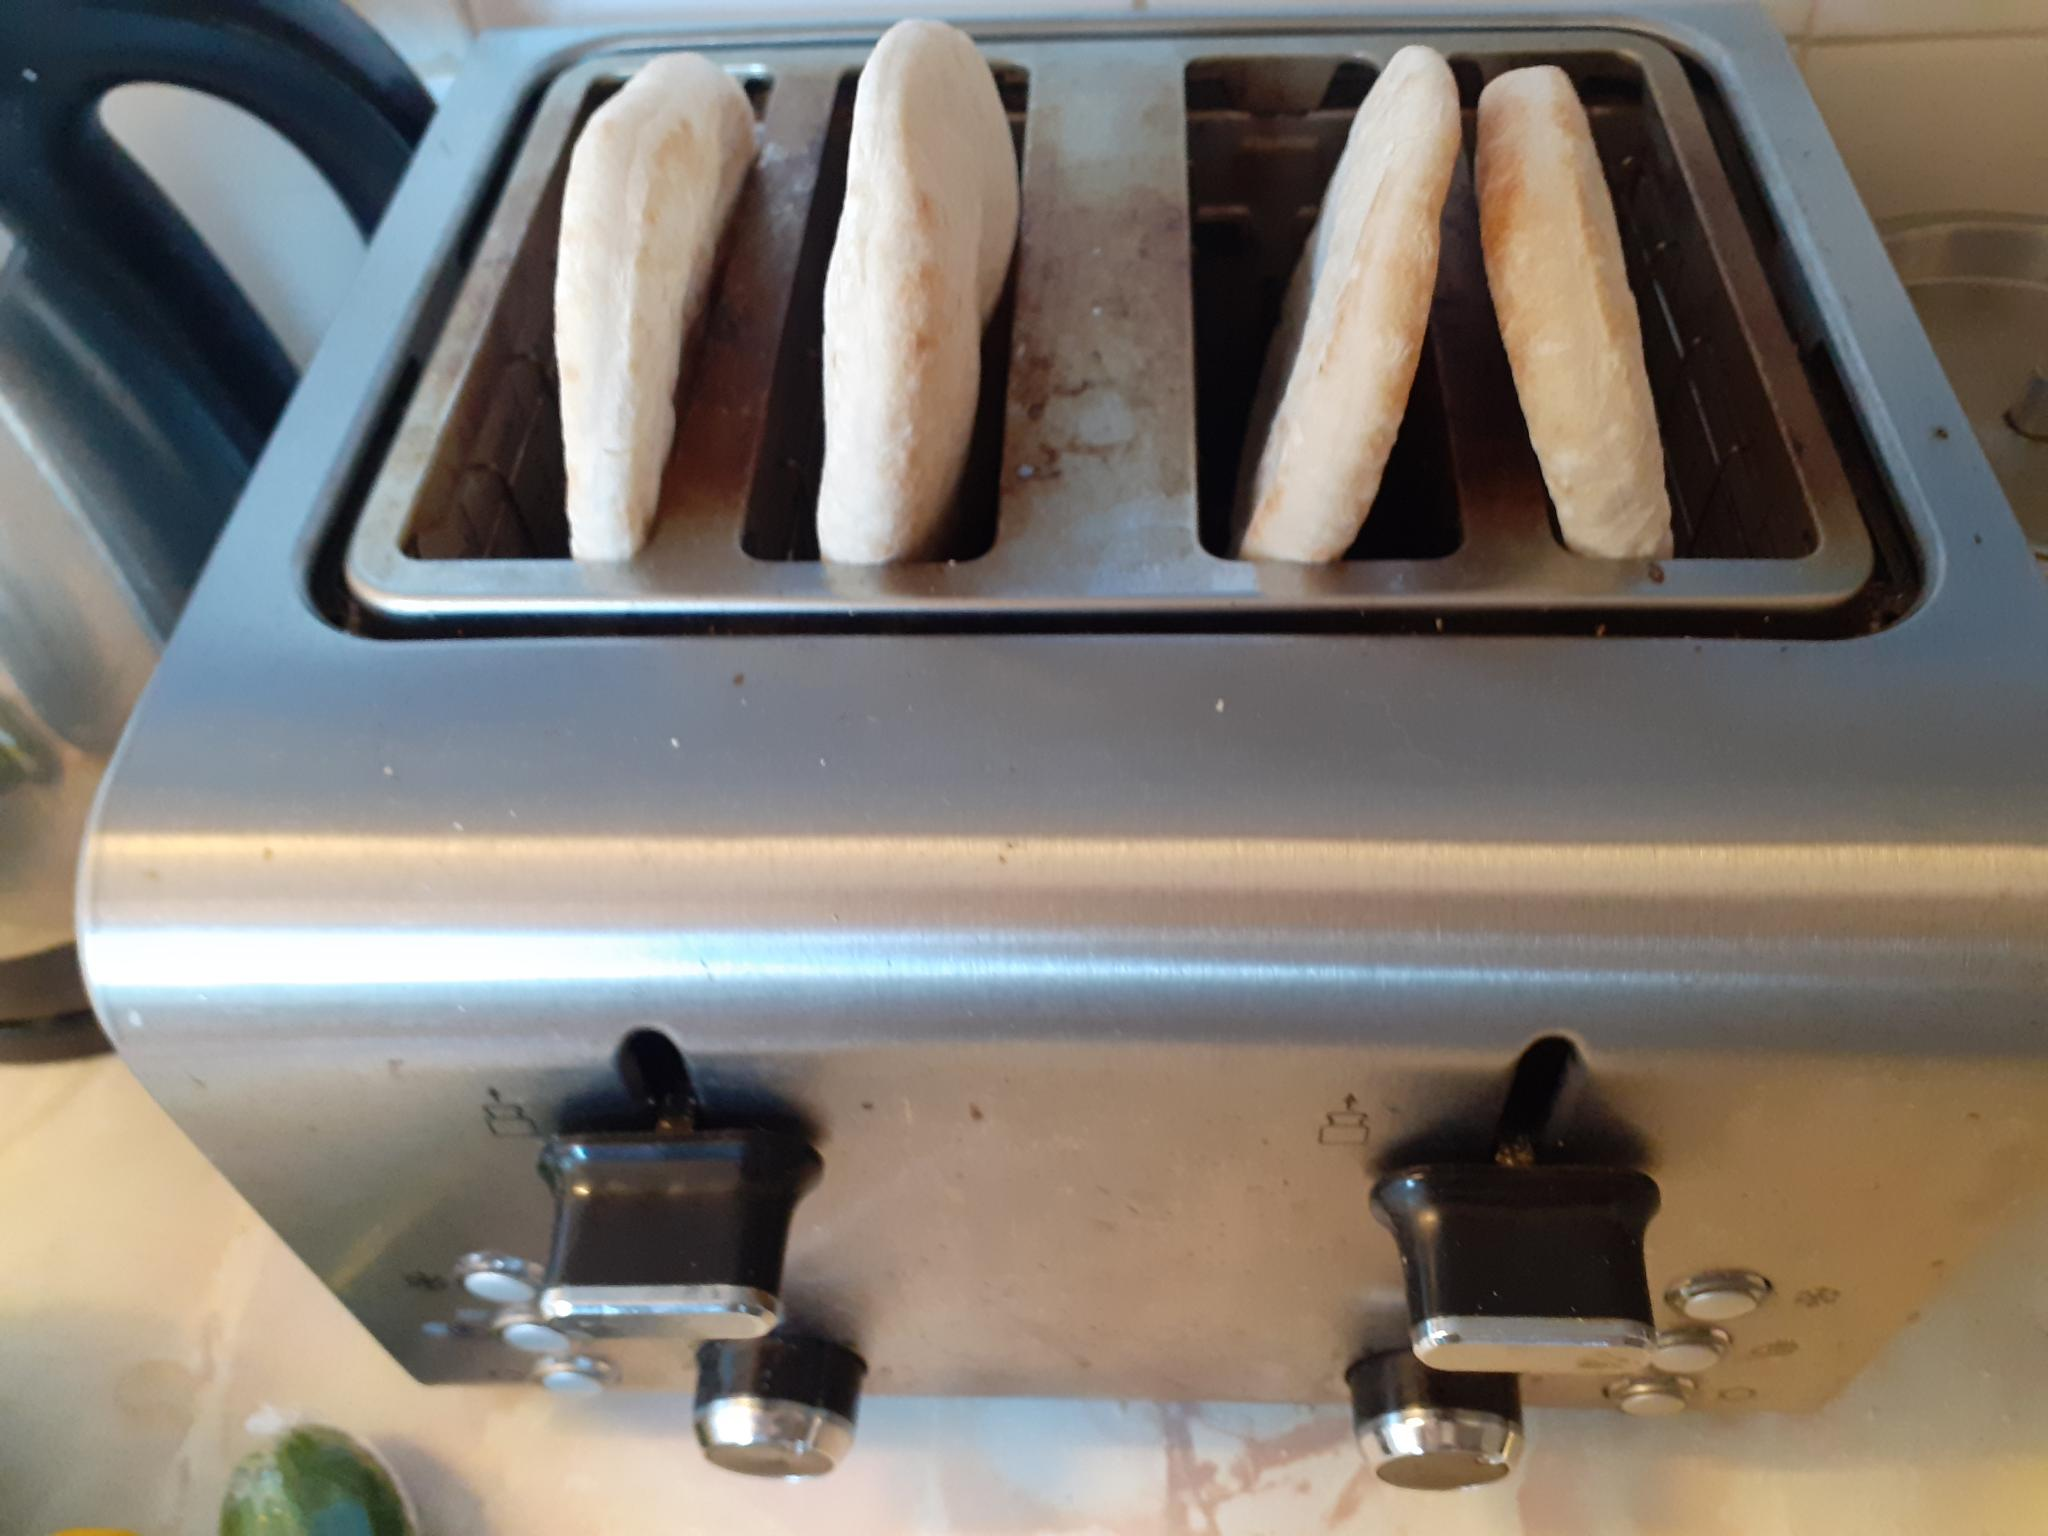 Chittys 5 minute half time dirty kebab-20200919_151842-jpg